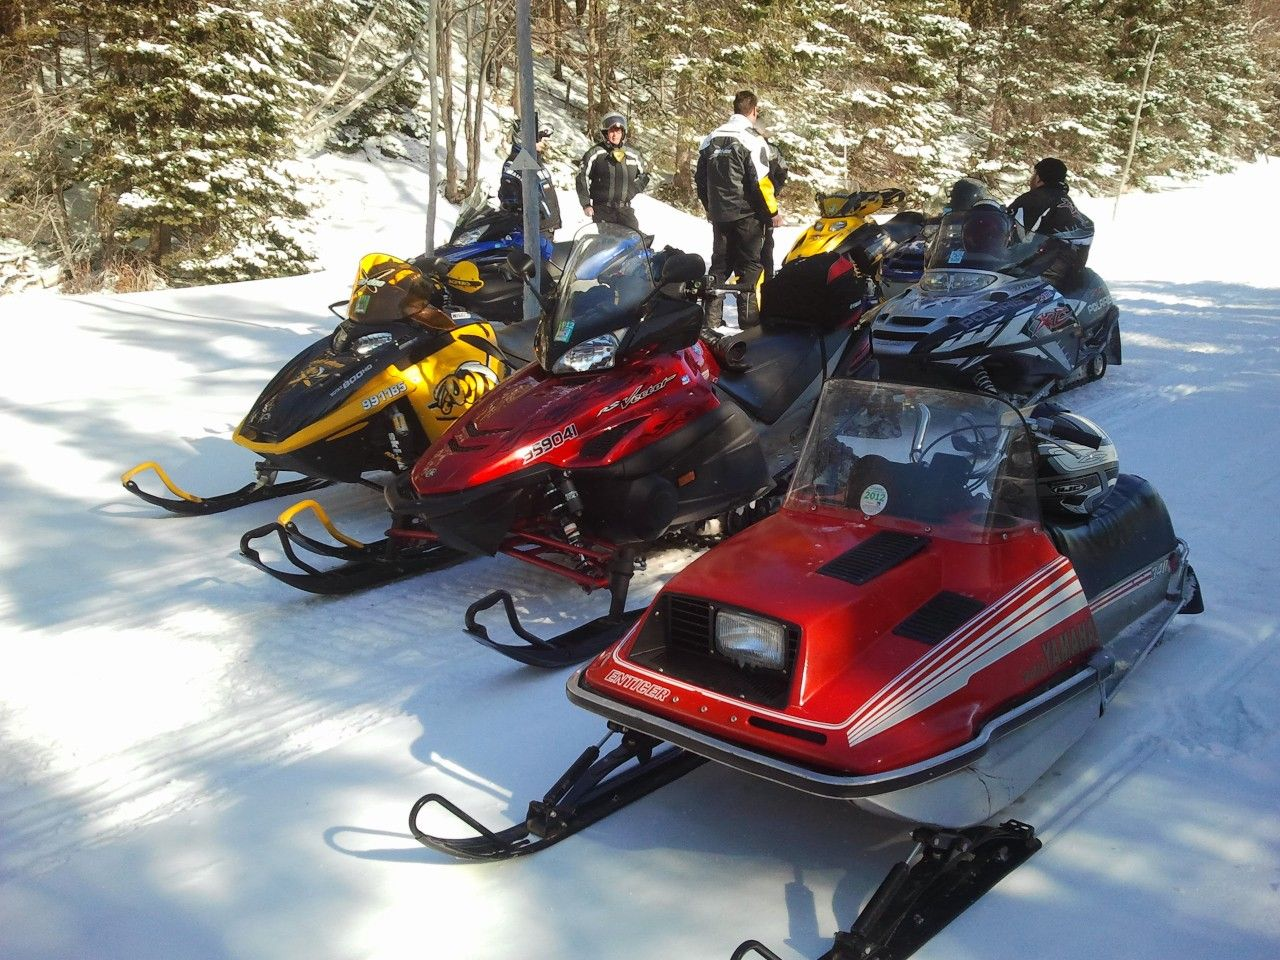 Ski whiz snowmobiles for sale - Enticer 340